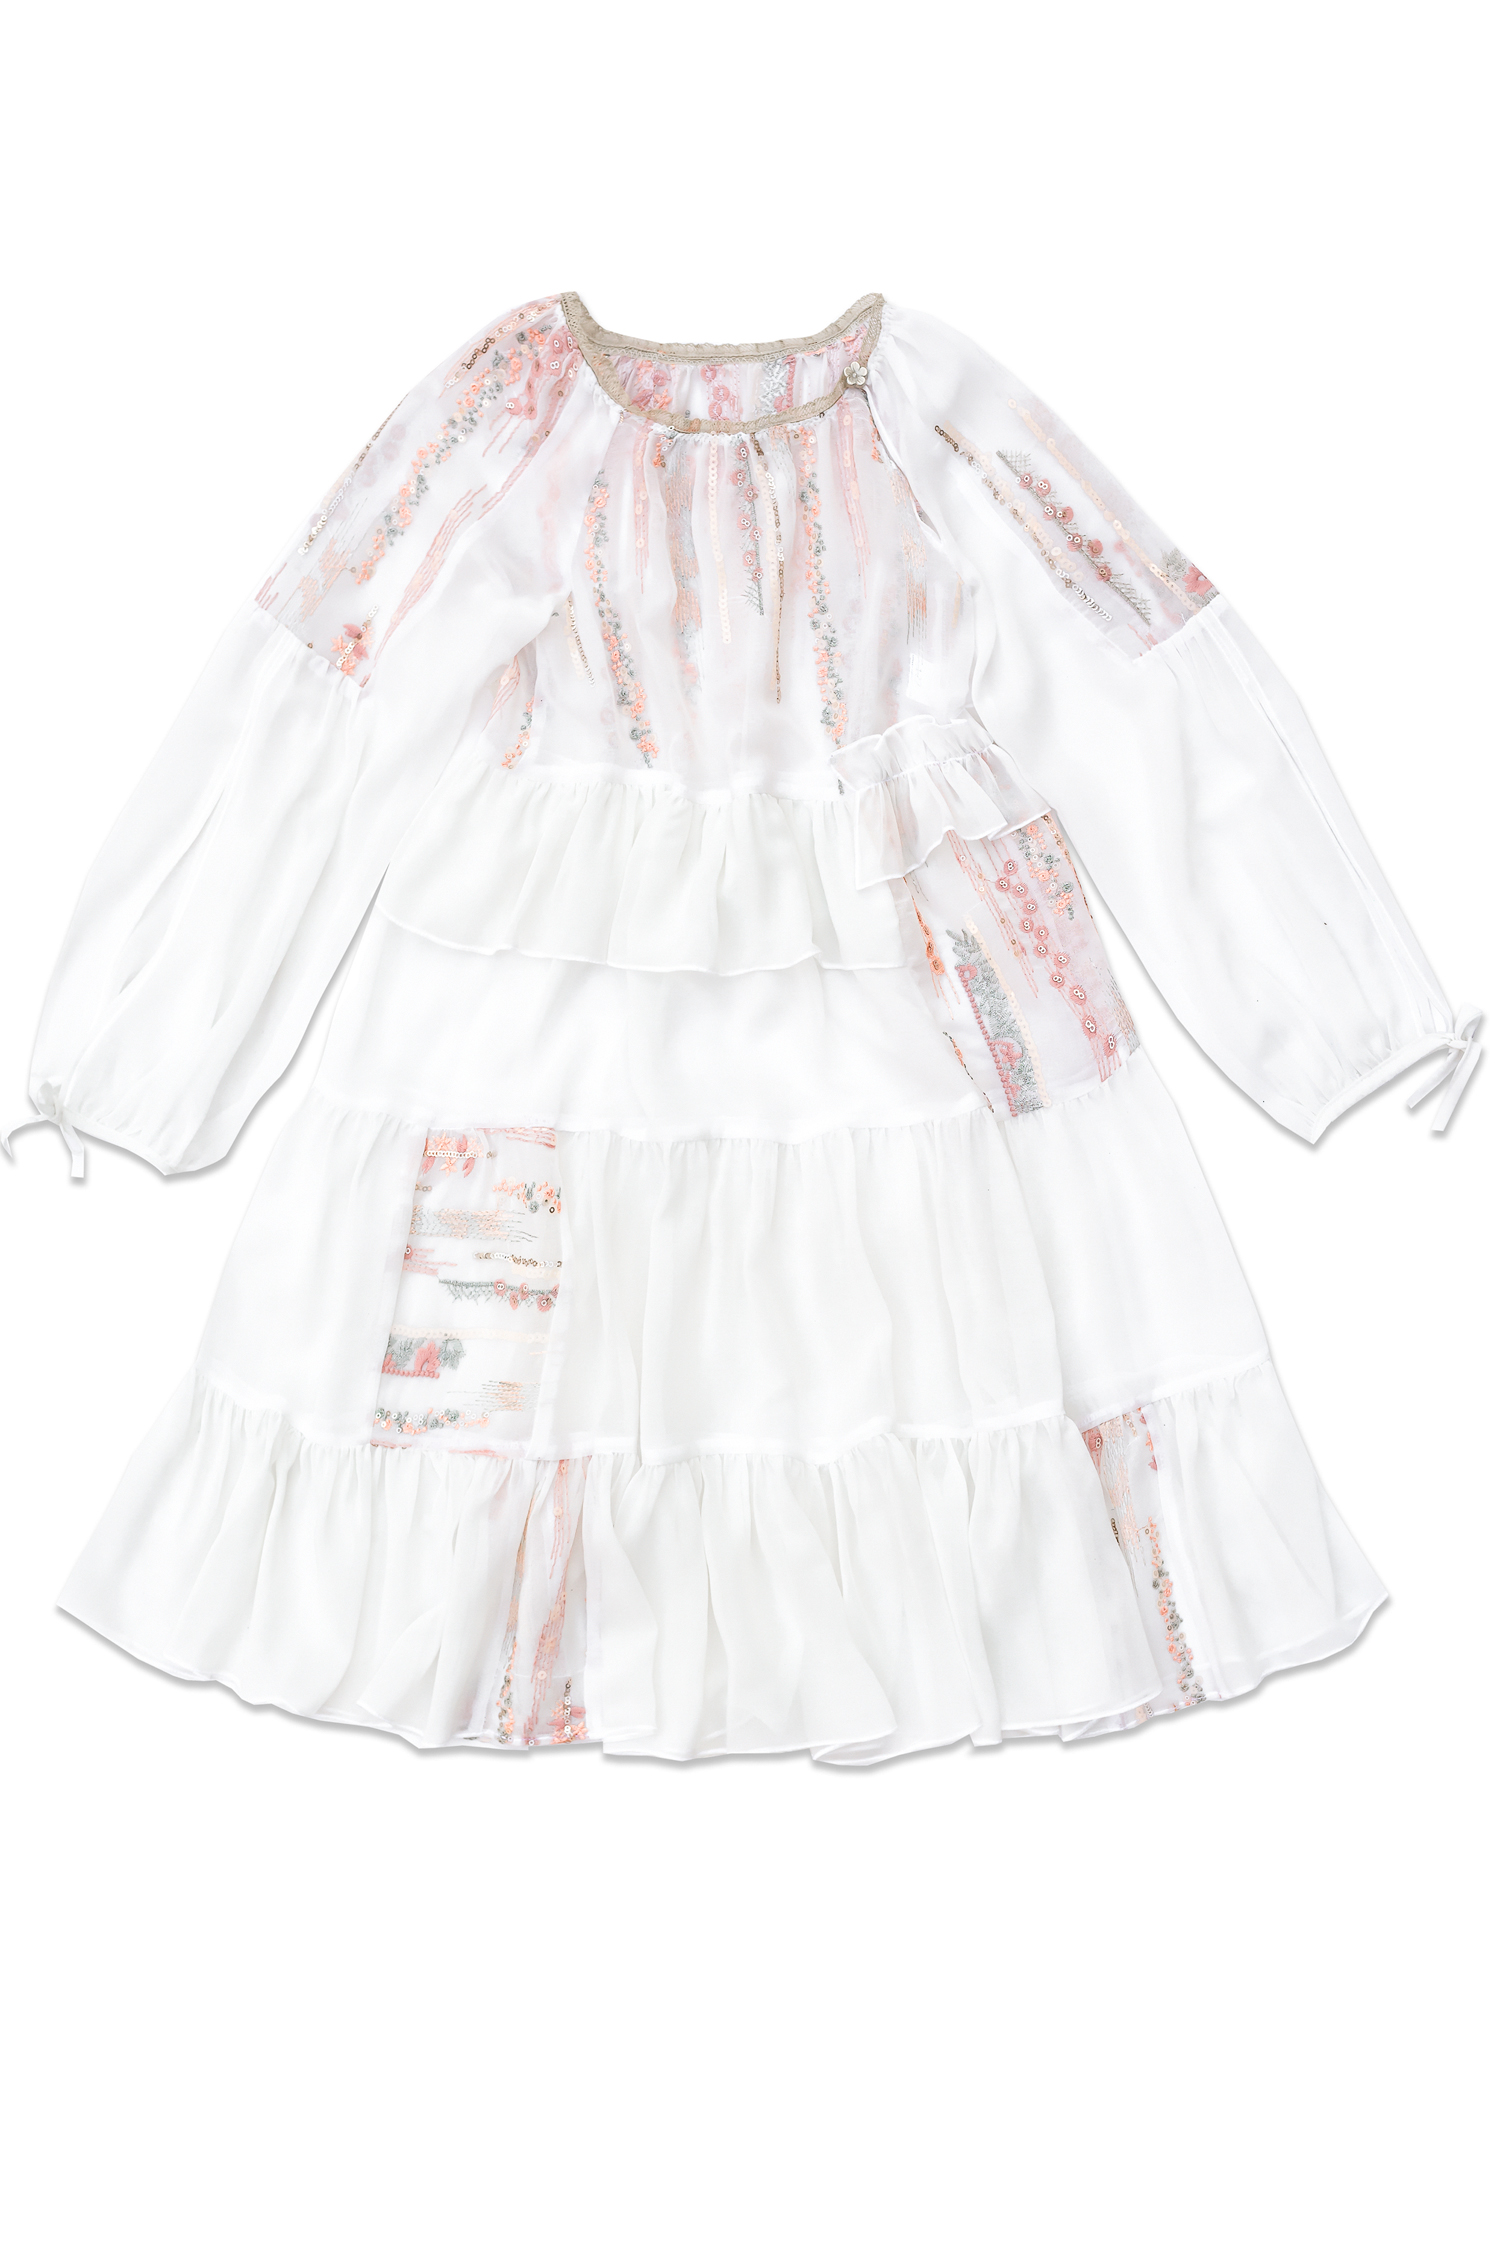 Rochie pentru fete Bella Voal alb Paiete IRIDOR